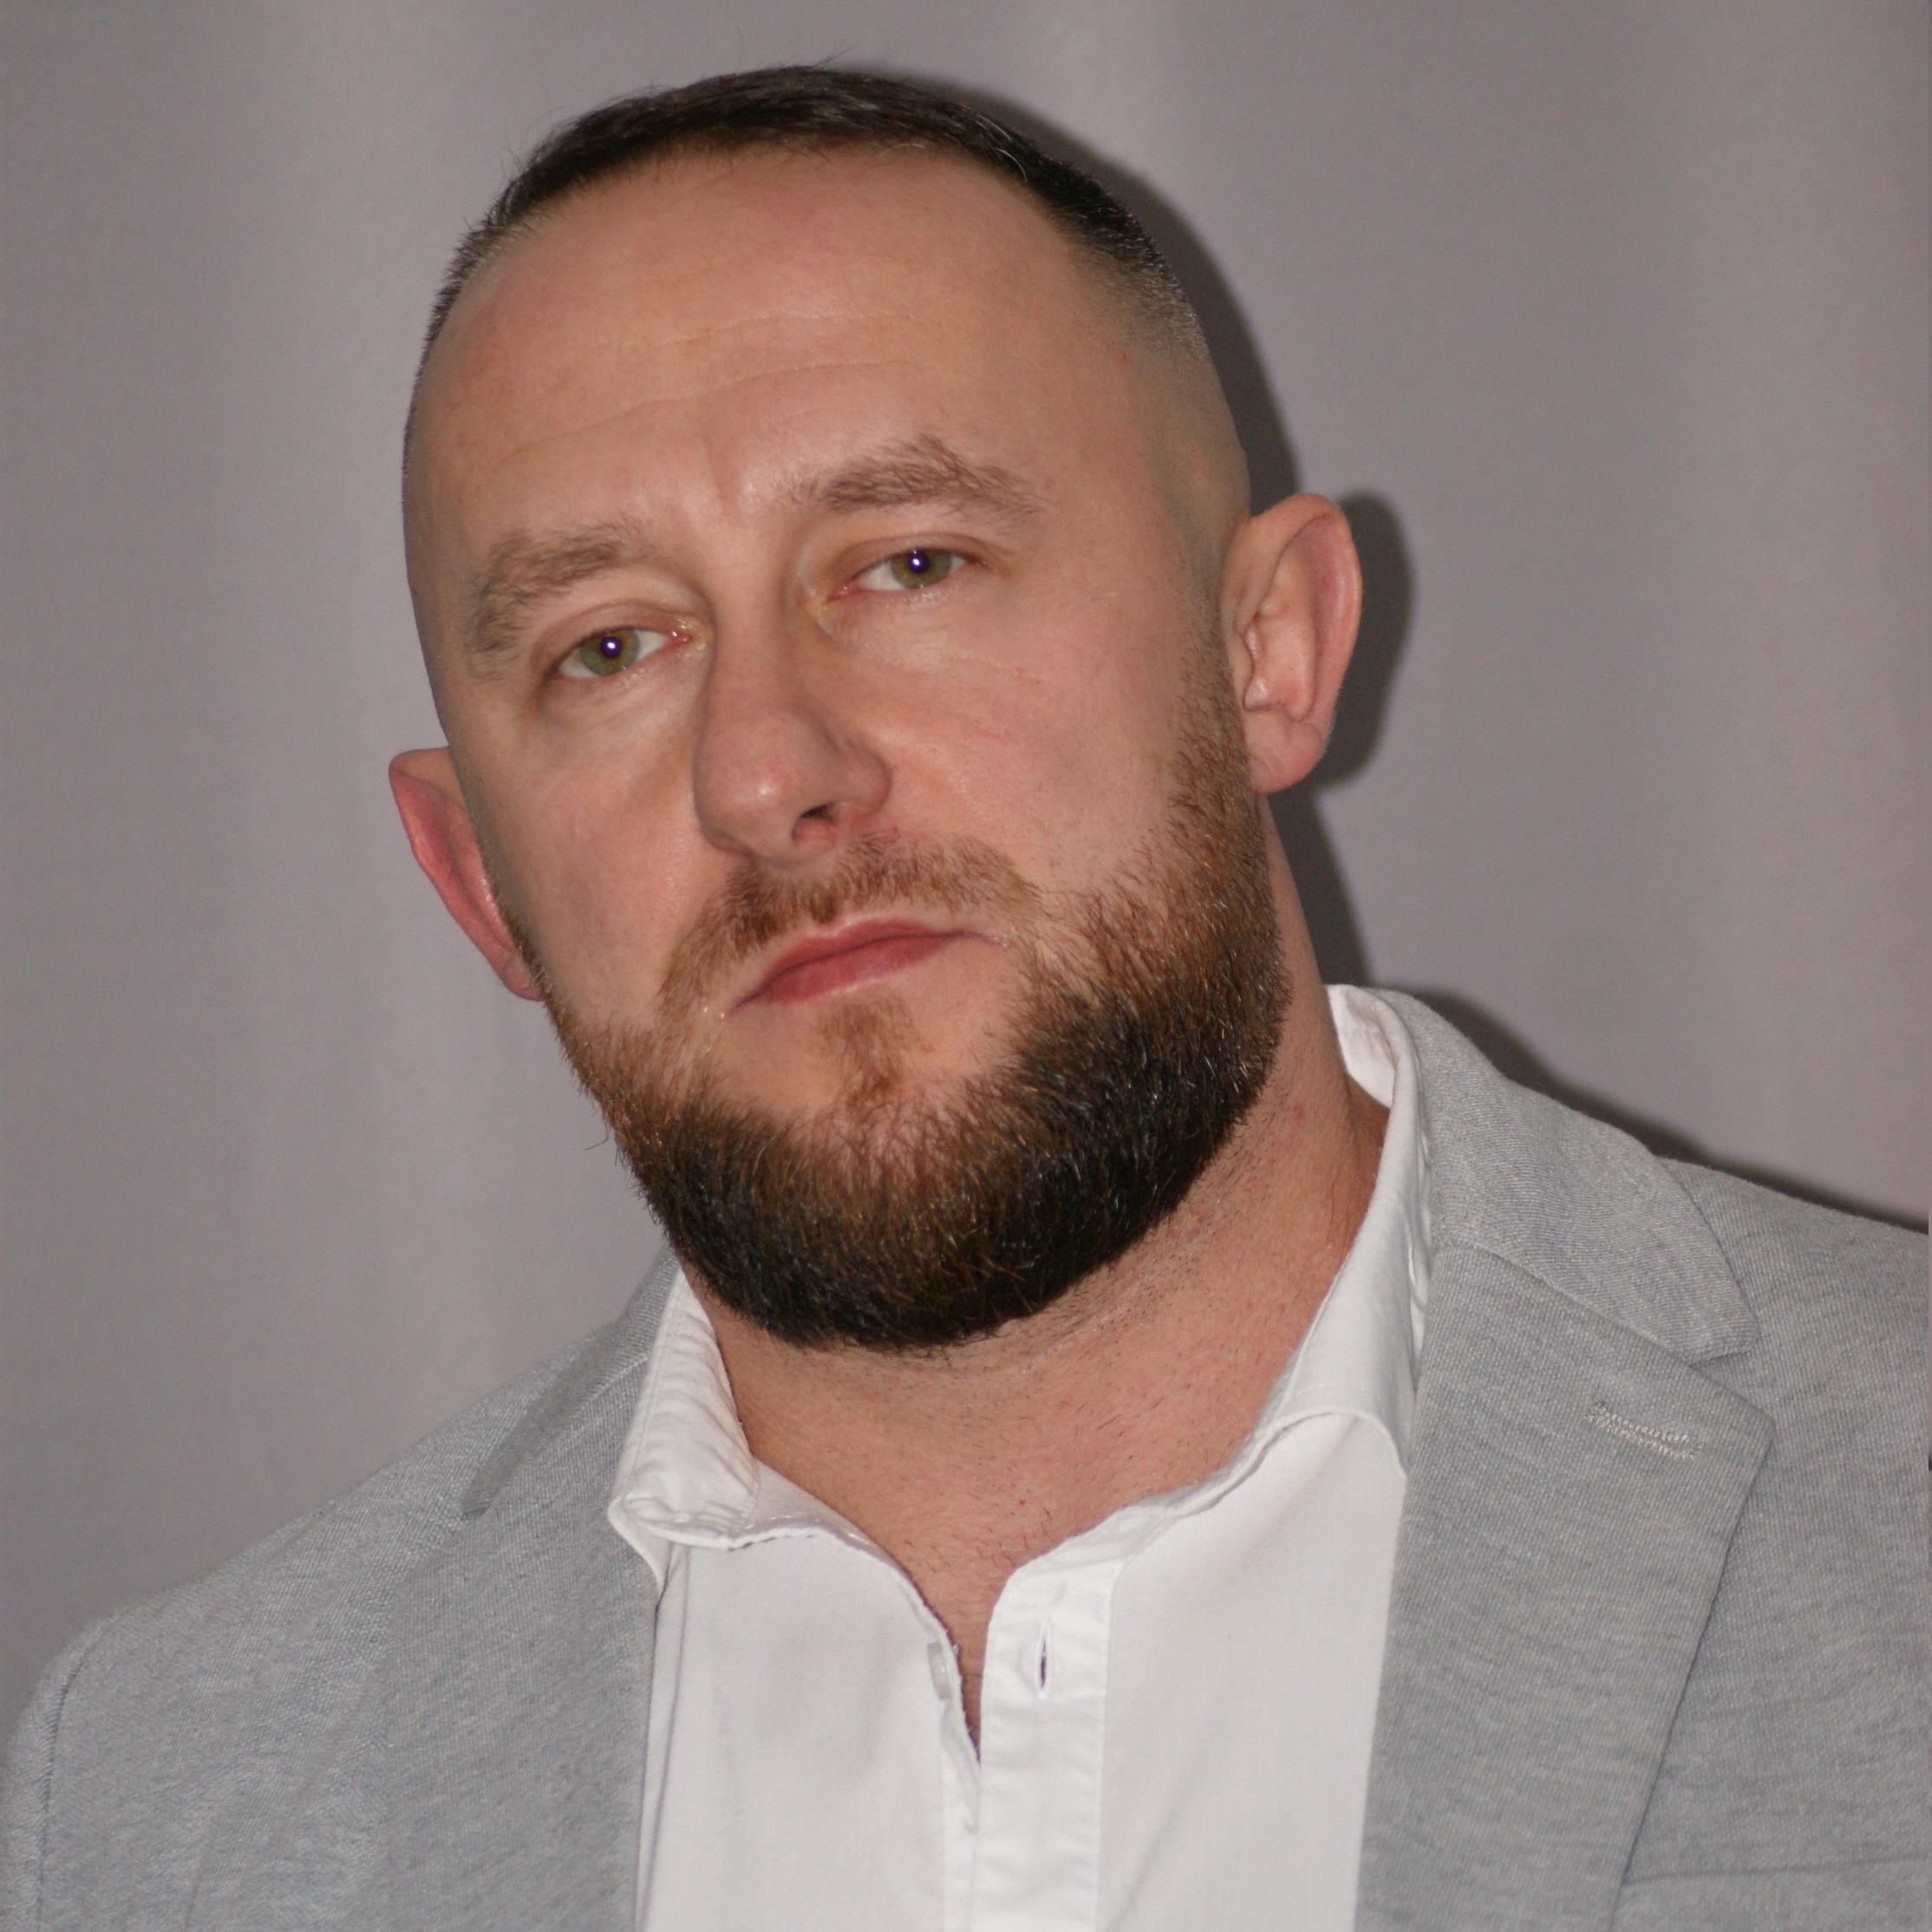 Mariusz Ciecierski